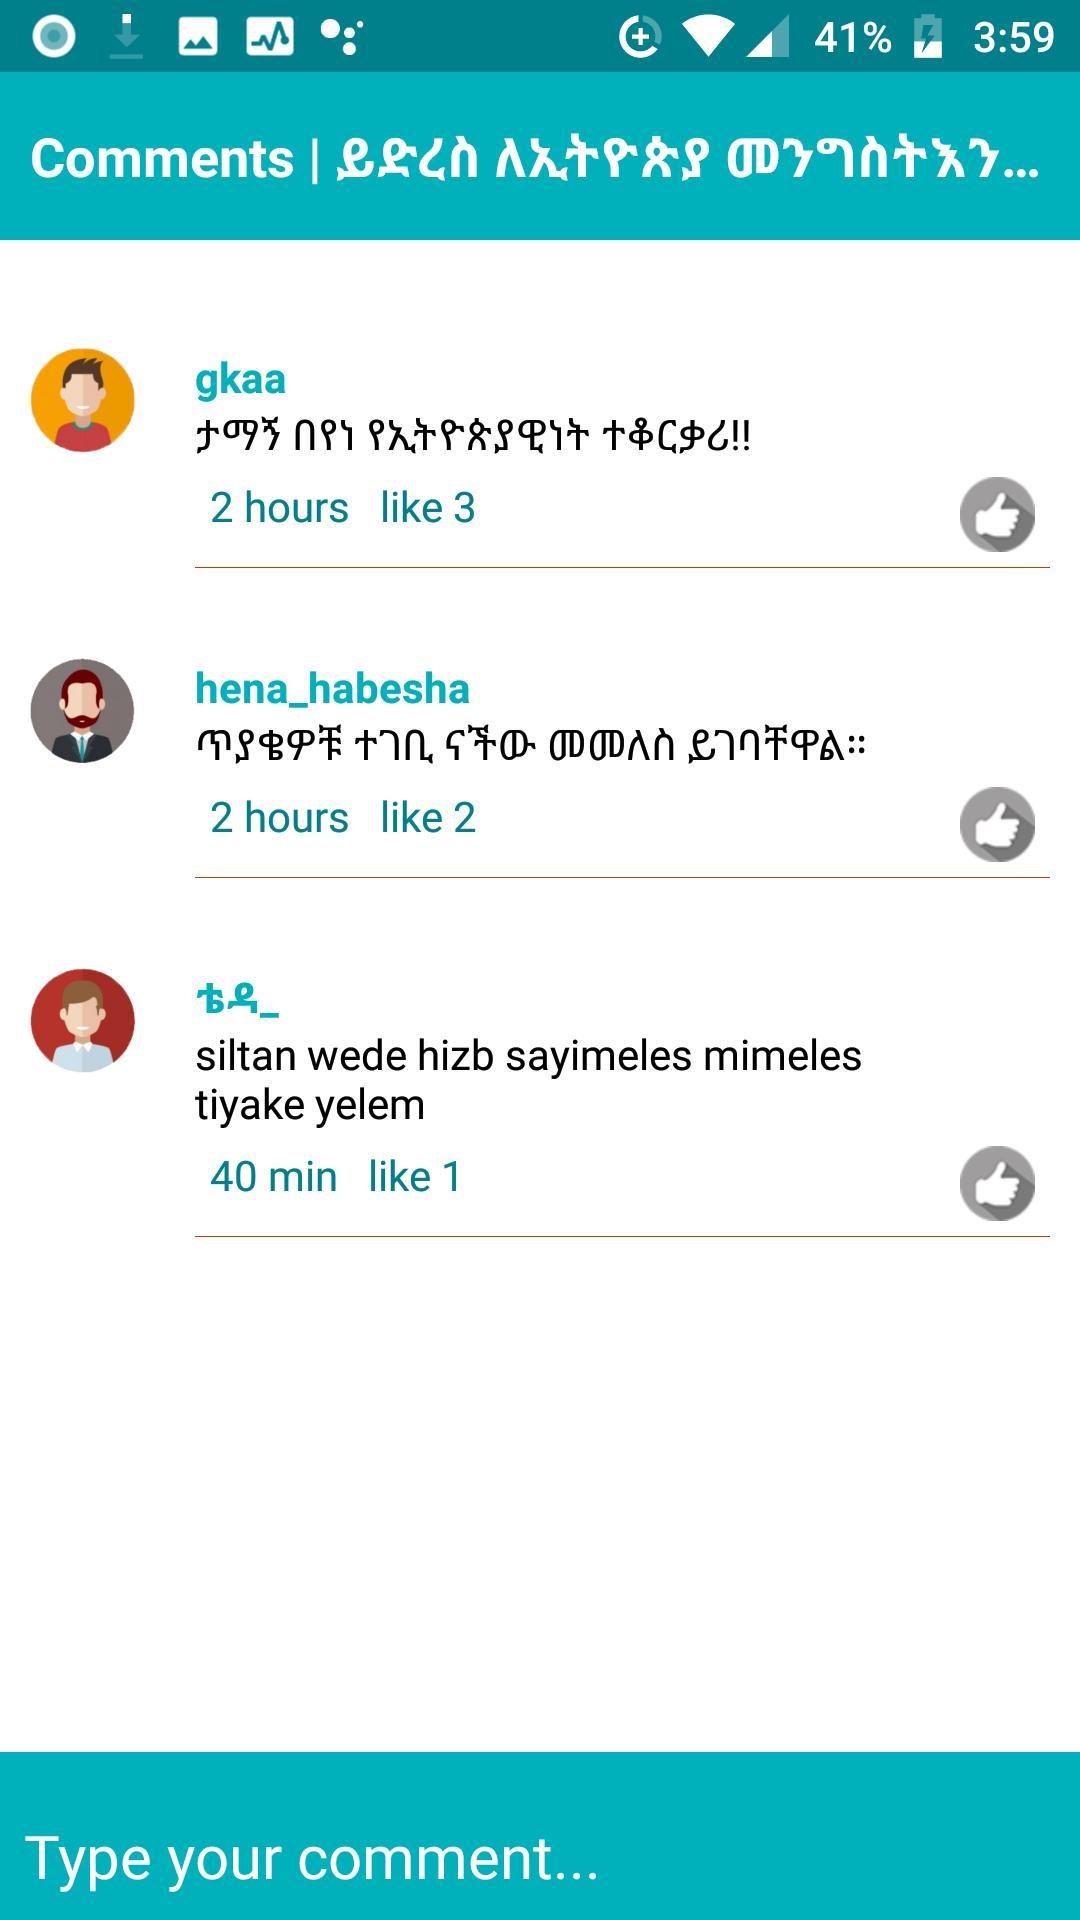 Addis Zena (Ethiopian / Amharic News) for Android - APK Download